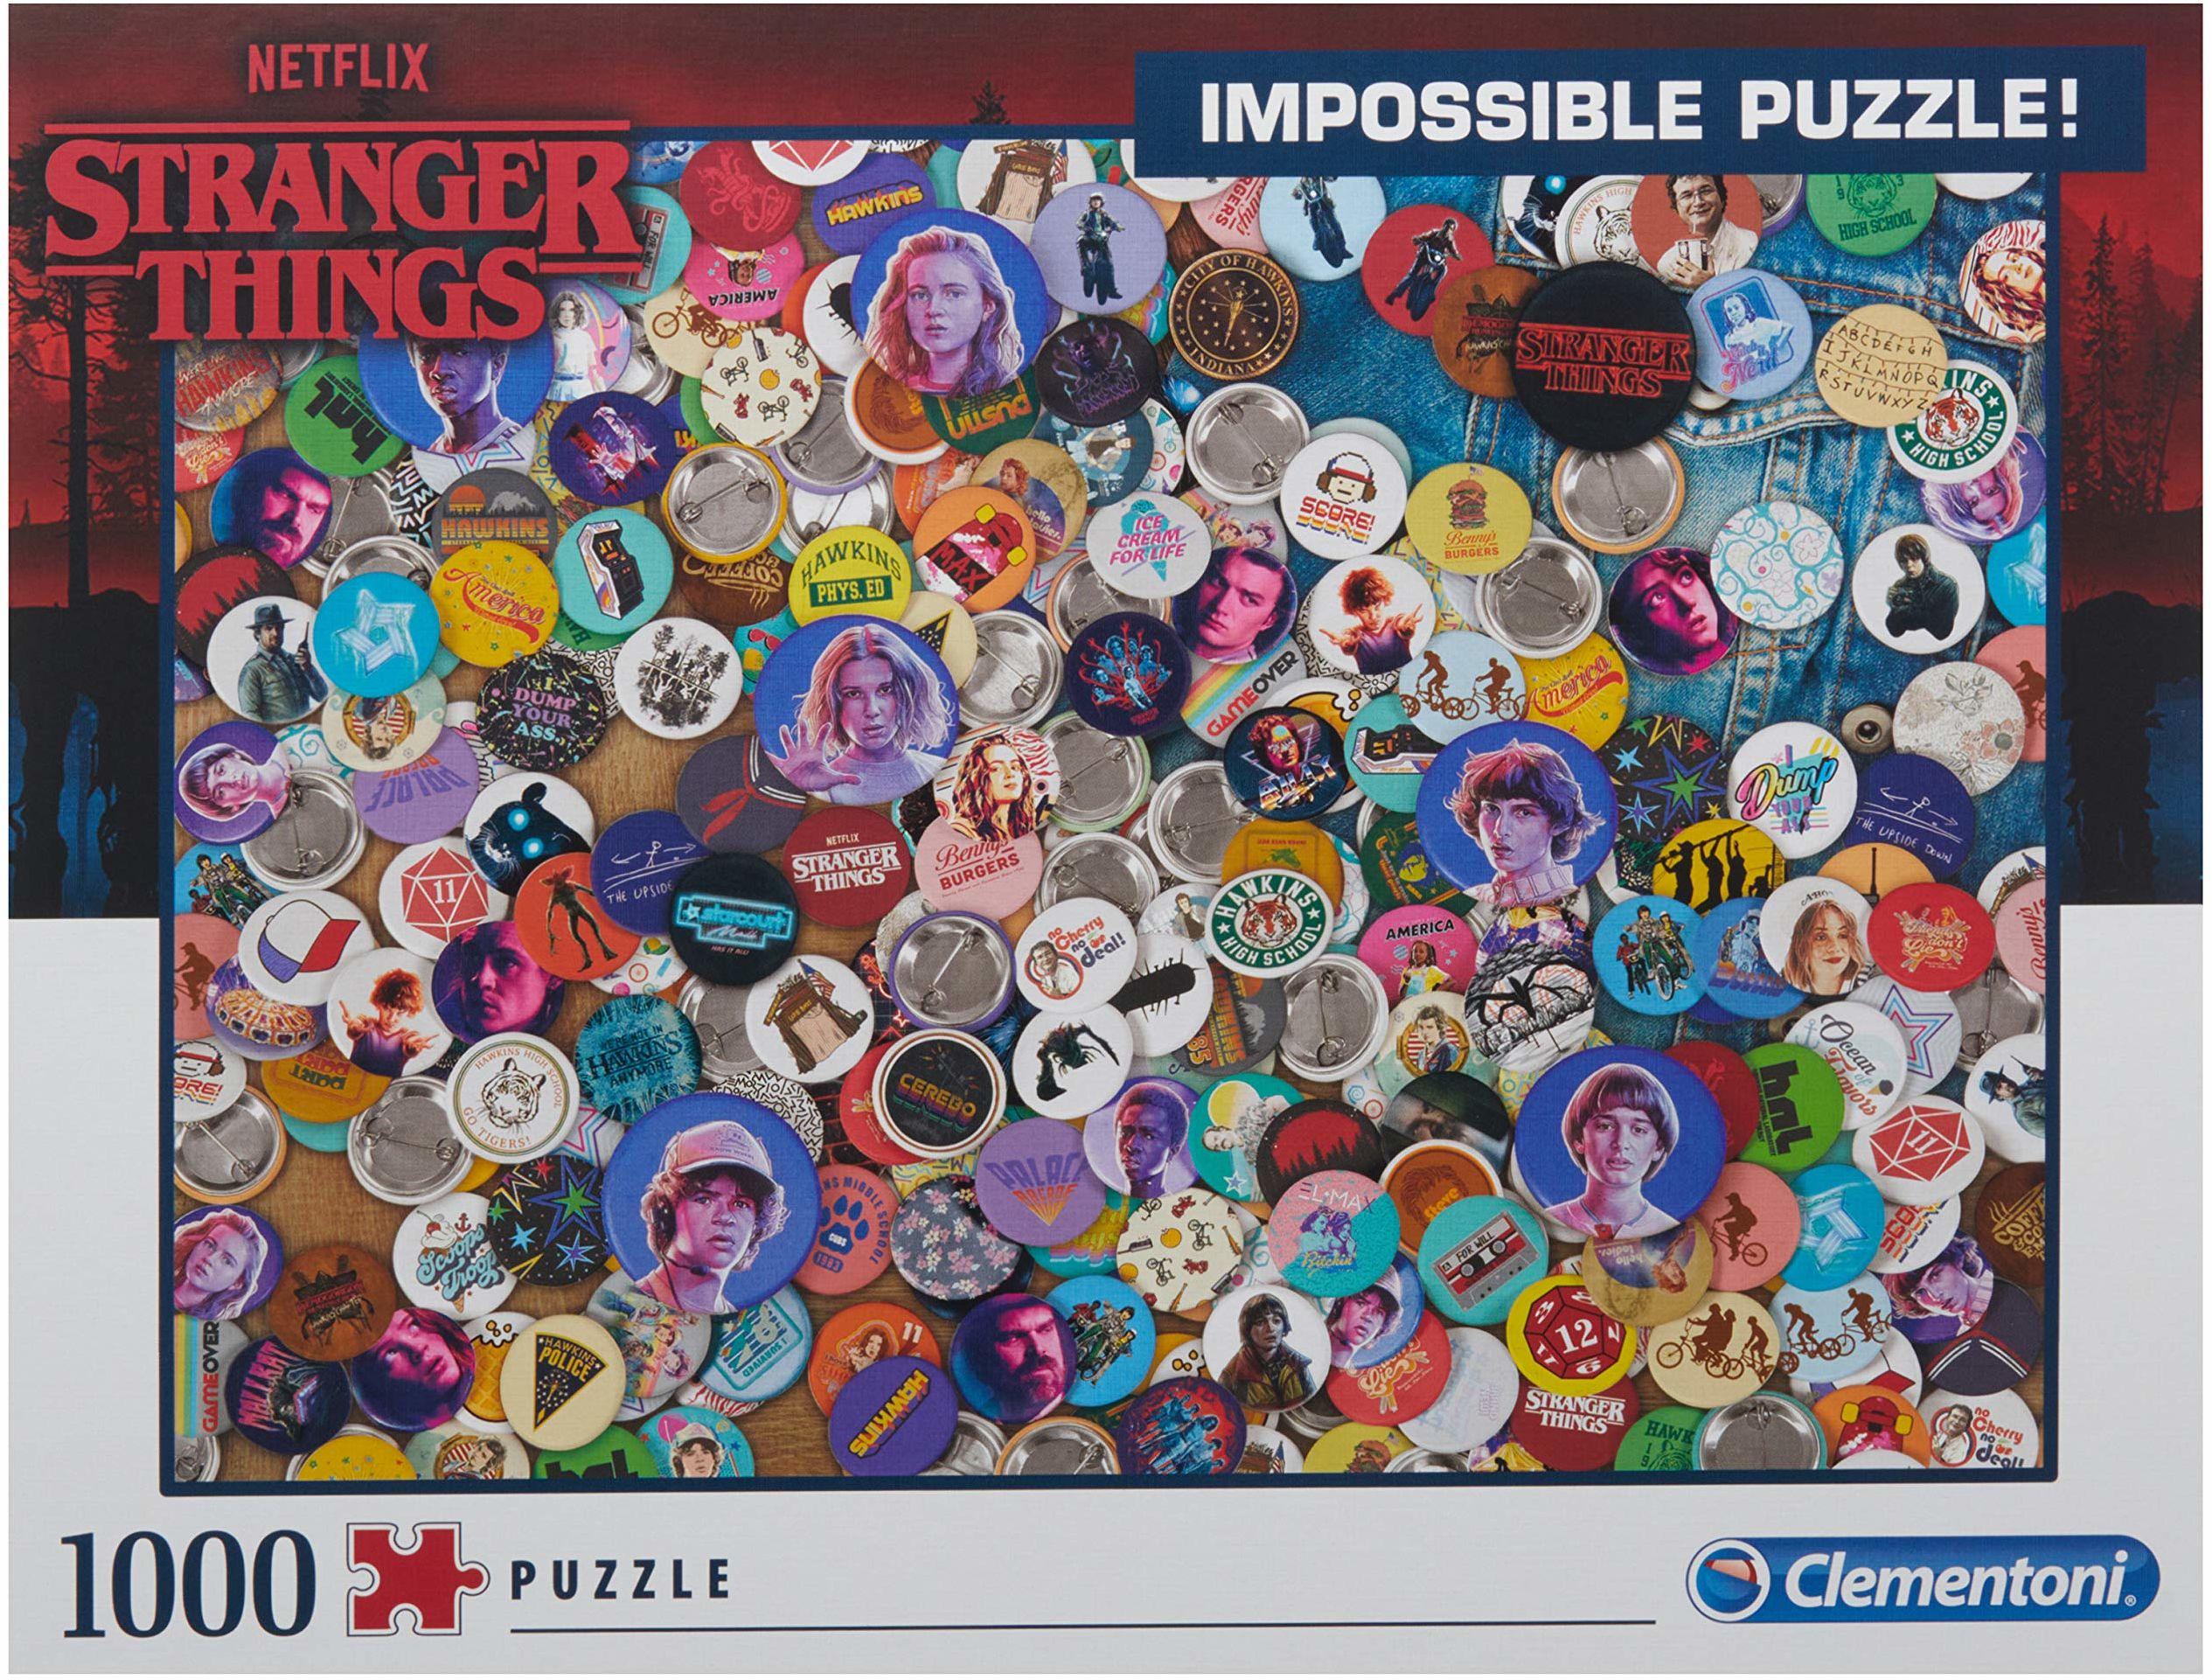 Clementoni 39528 Stranger Things Things-1000 szt. niemożliwe puzzle